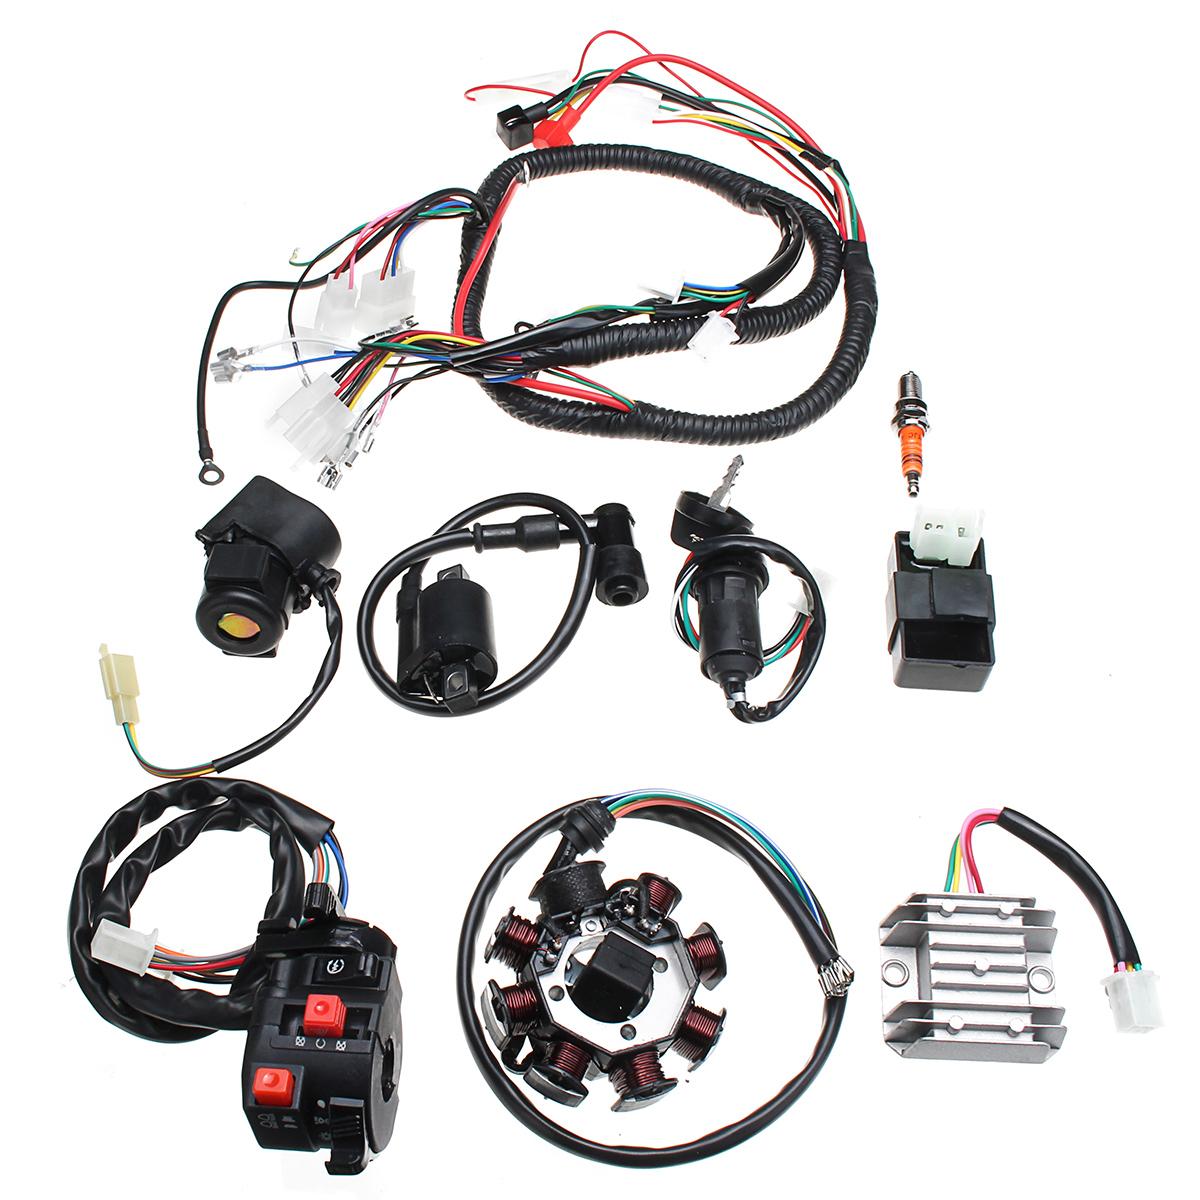 Electric Wiring Harness Wire Loom Cdi Motor Stator Full